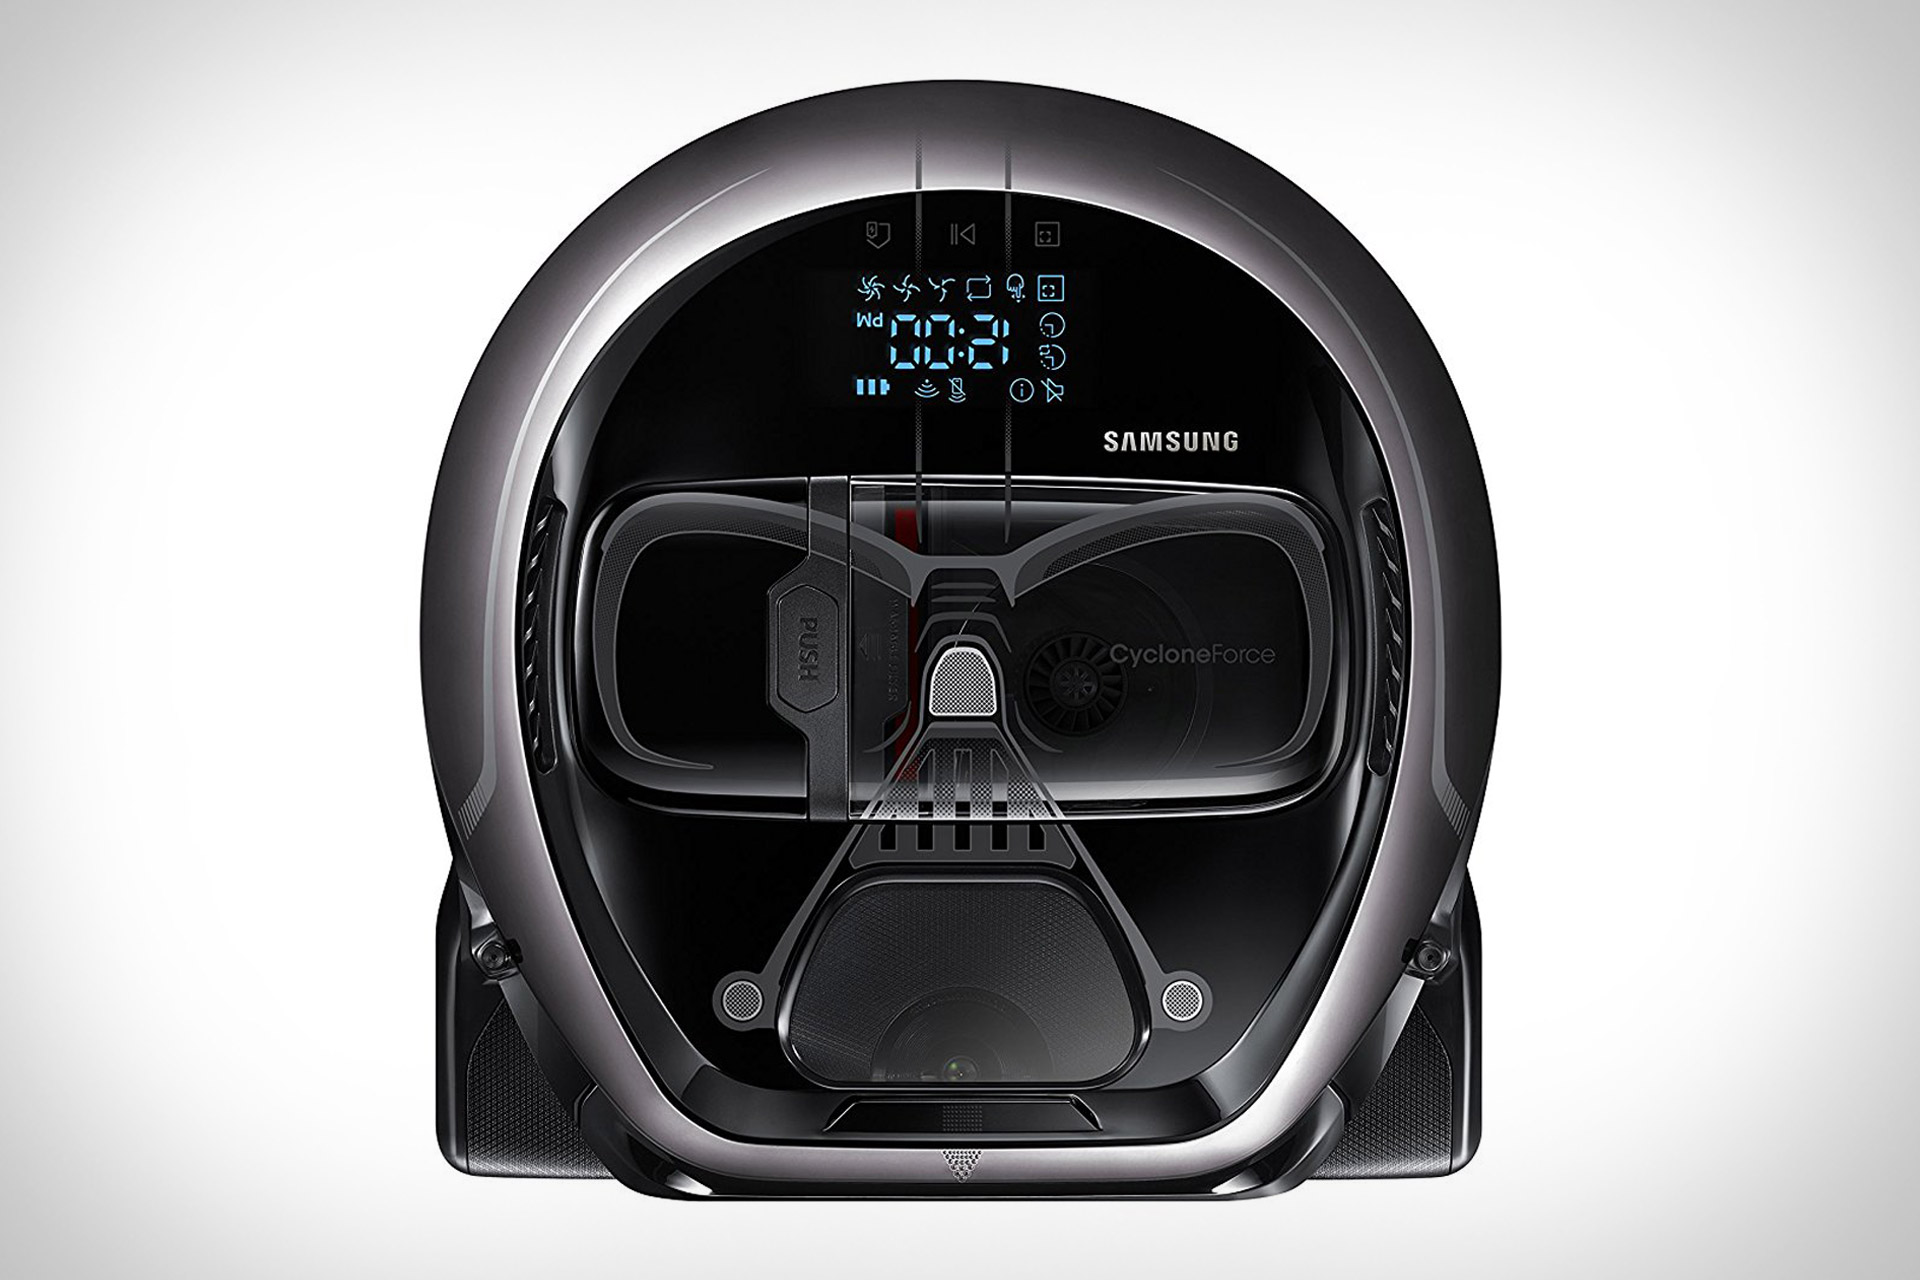 Samsung Darth Vader Powerbot Vacuum